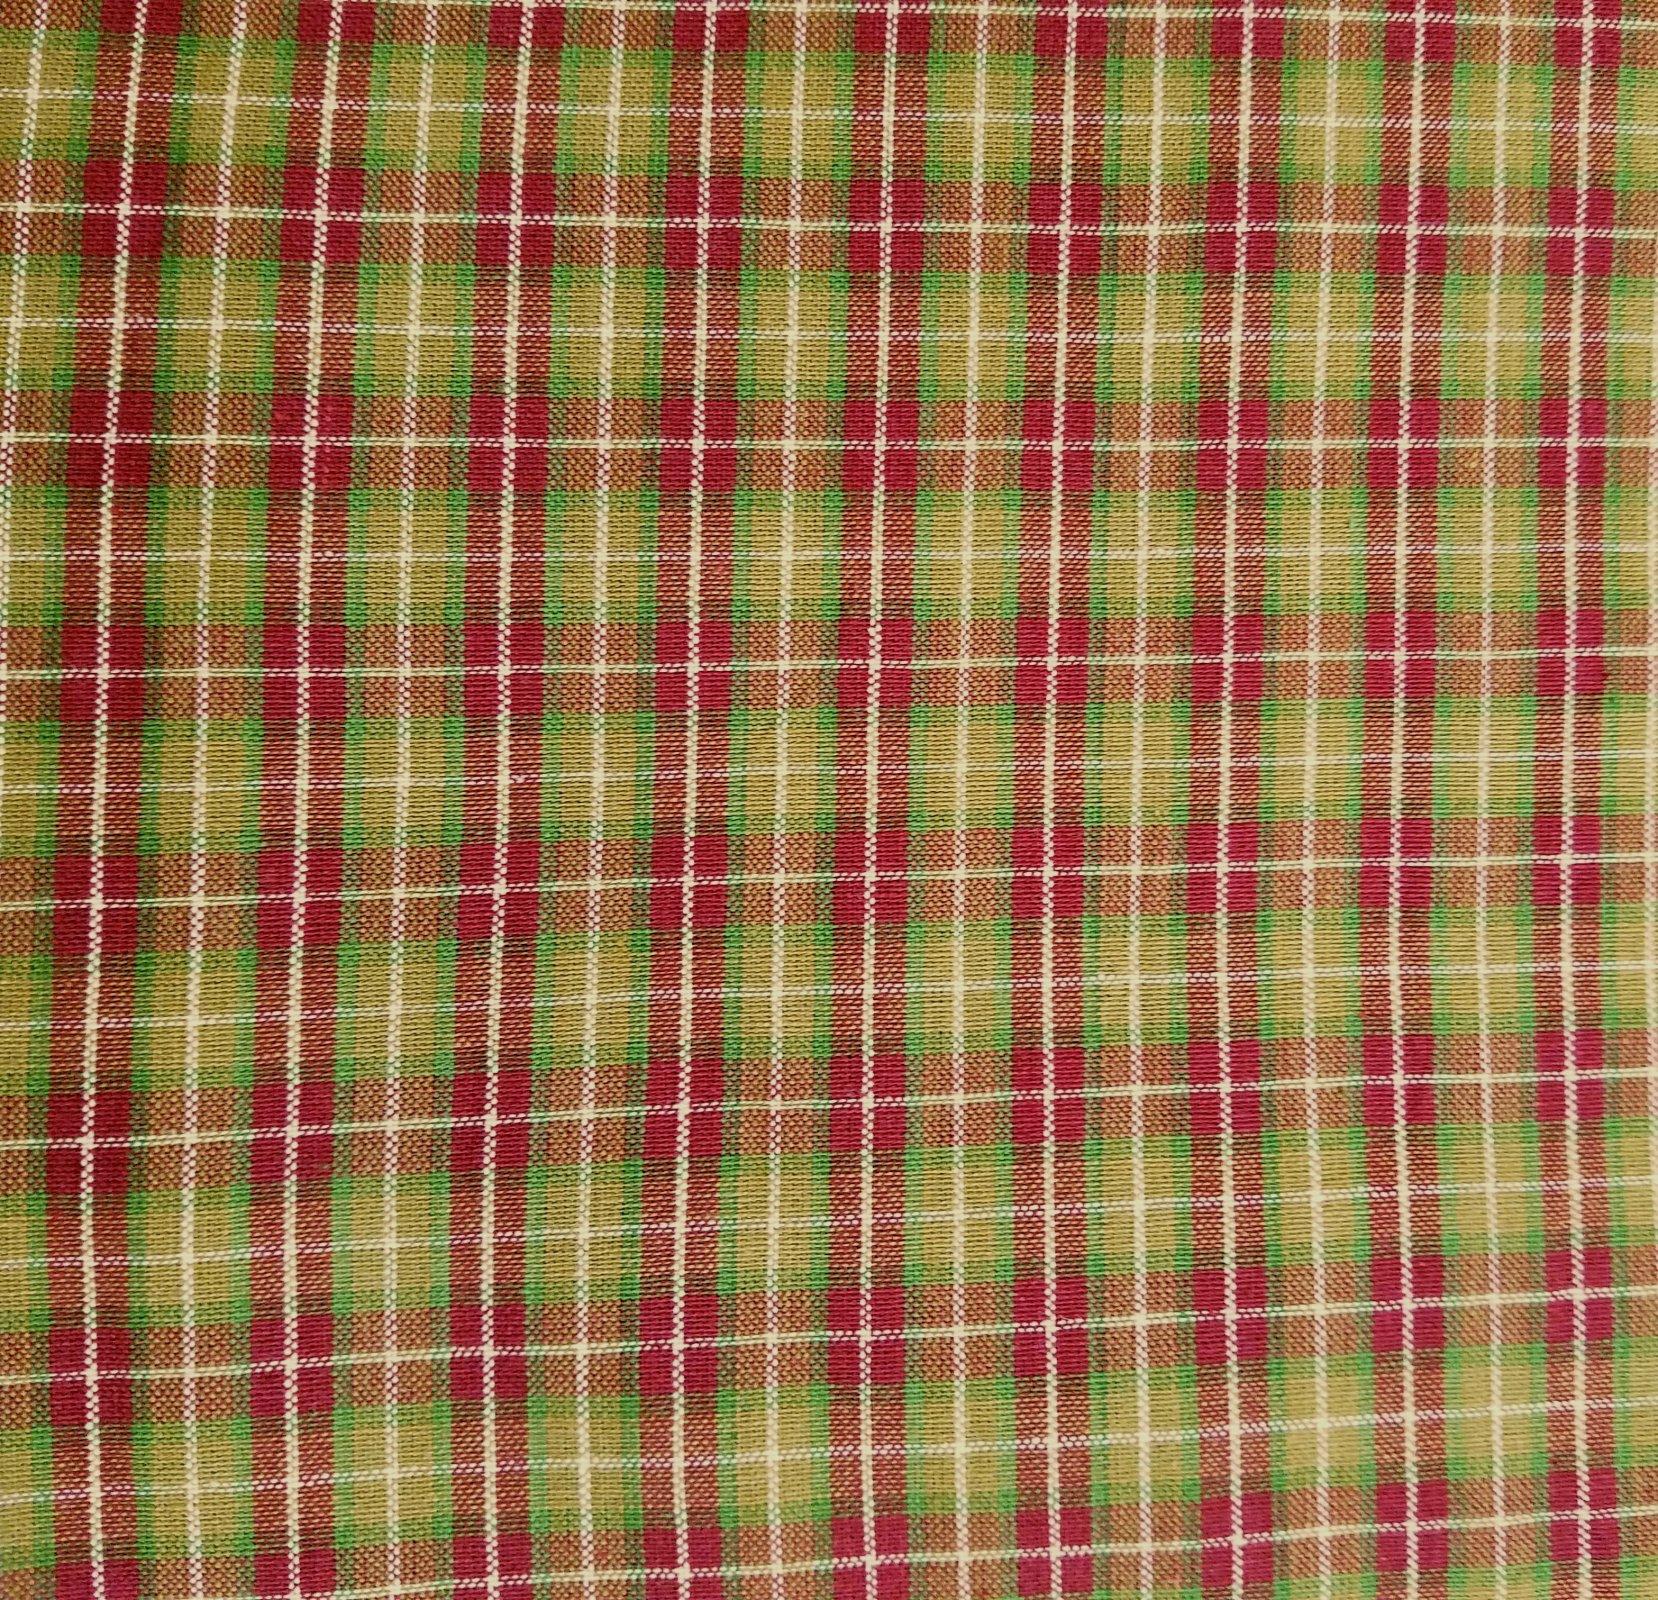 MDG Homespun - Red/Green Plaid